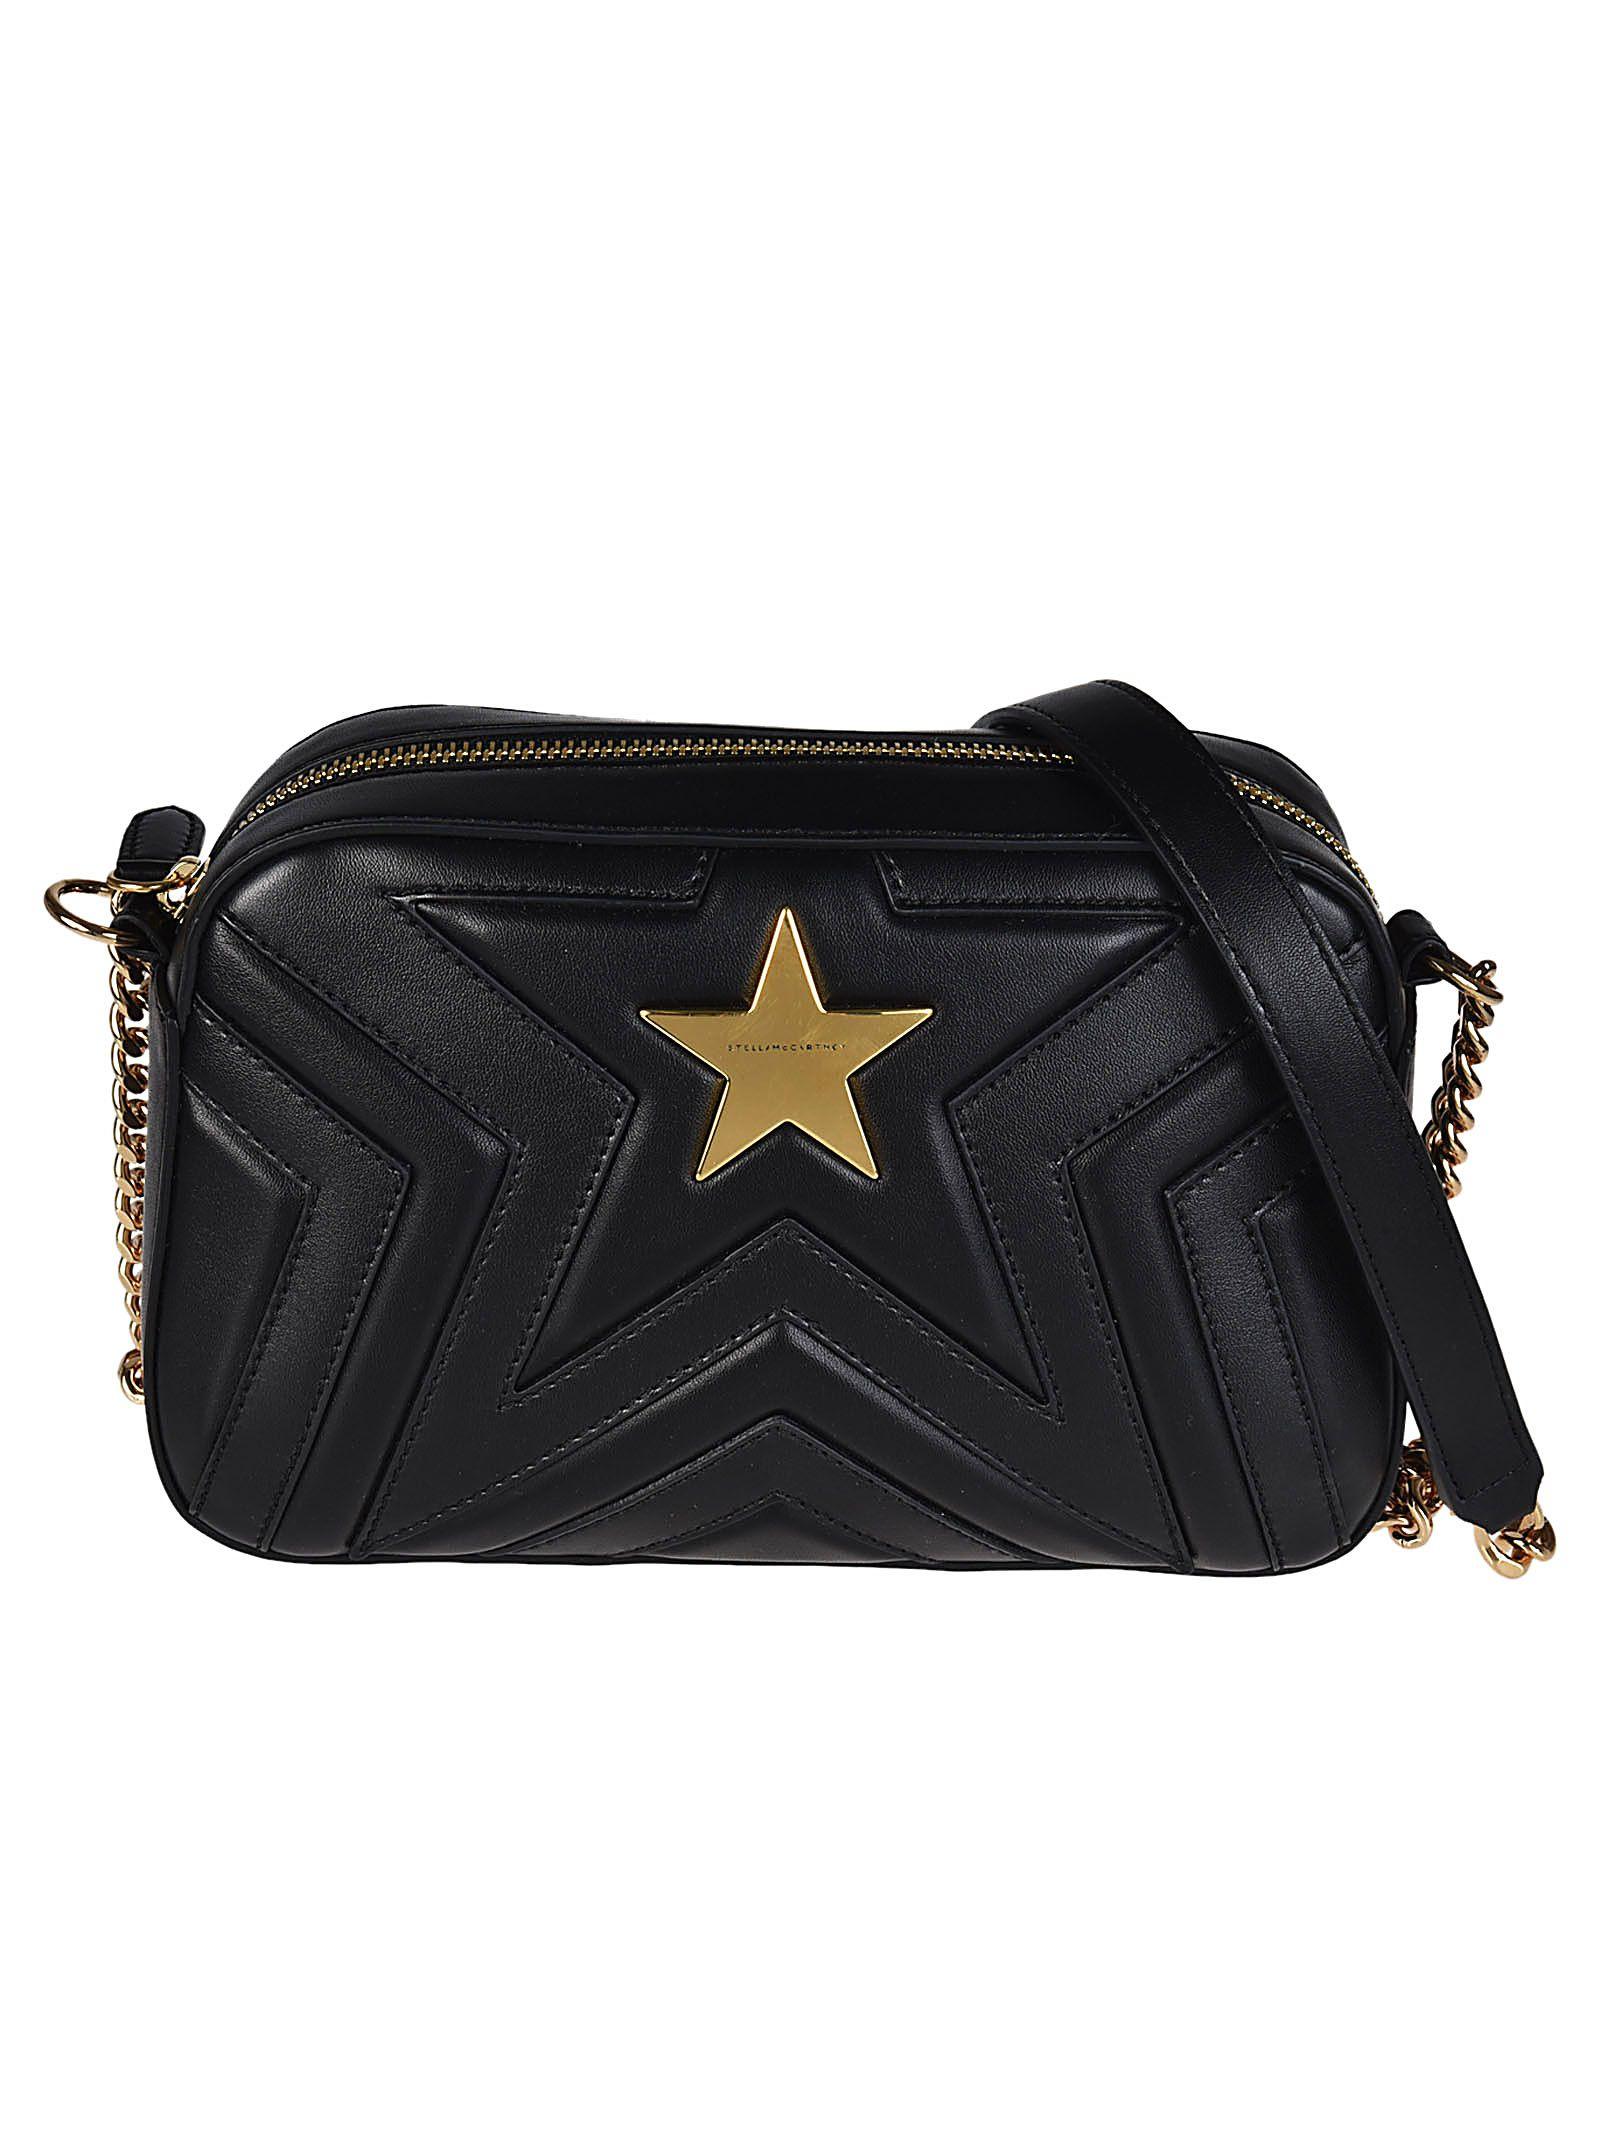 Stella Mccartney Star Small Shoulder Bag